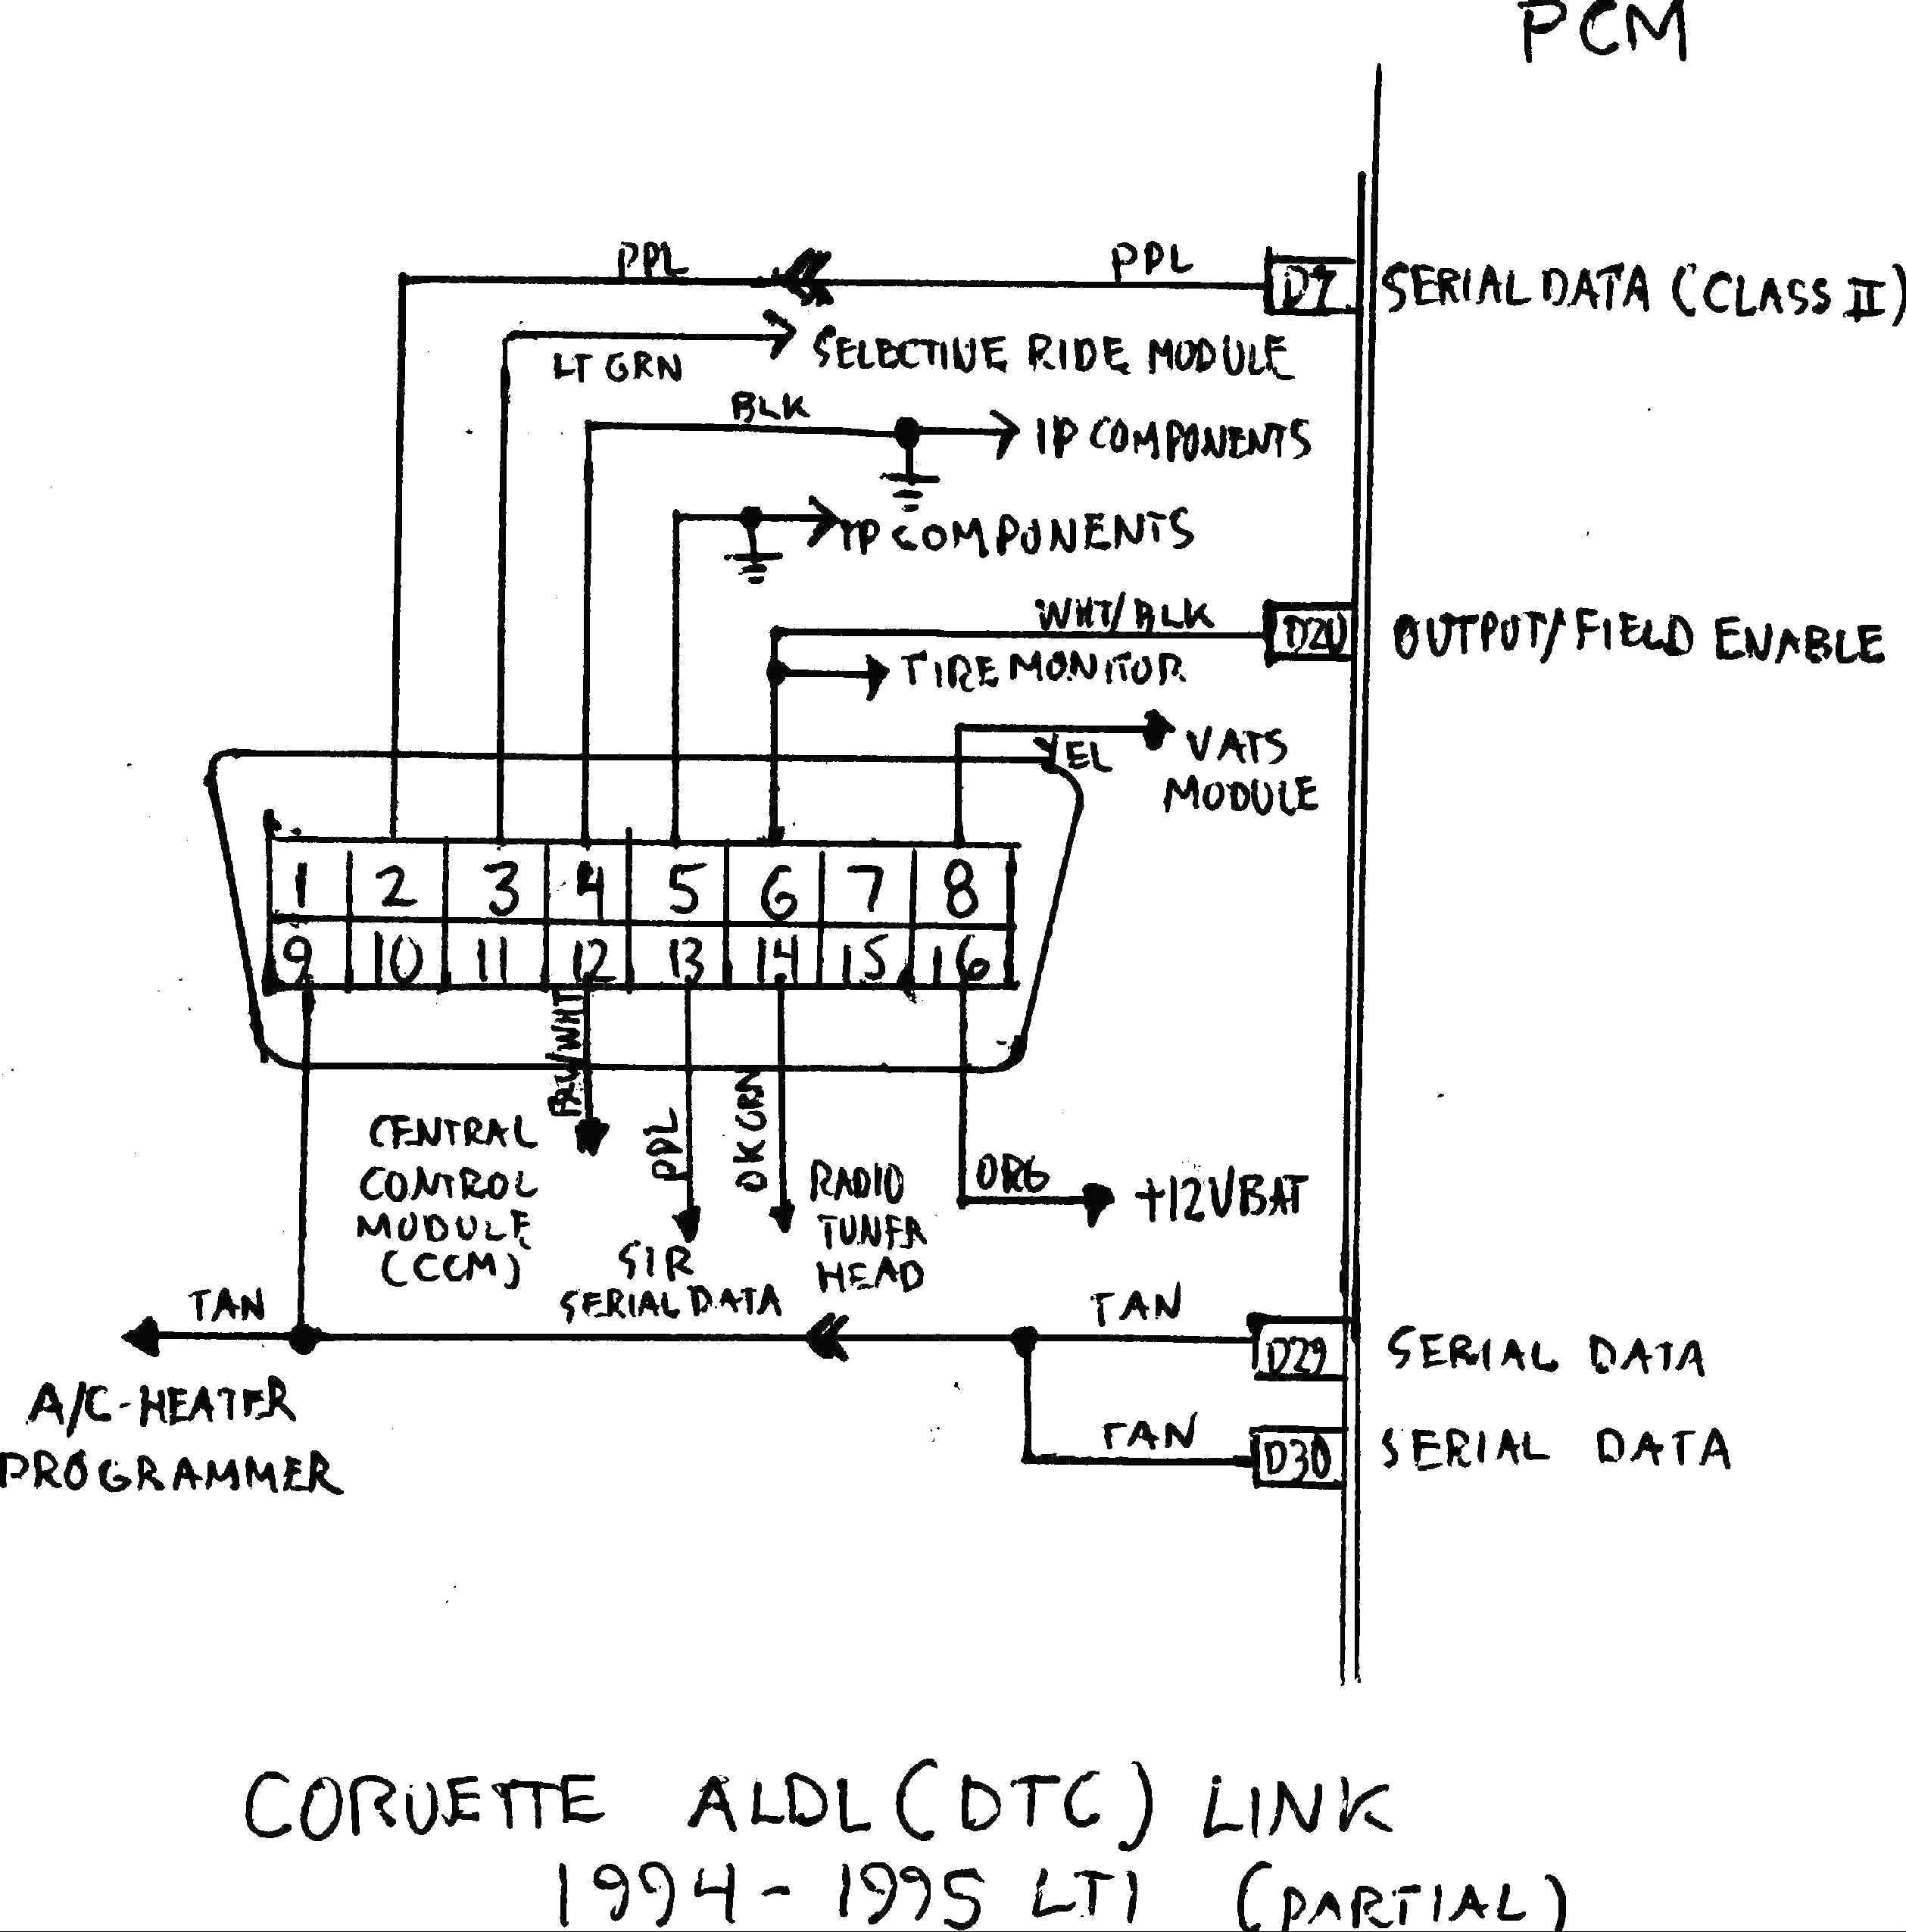 Buick Regal Obd2 Wiring Diagram | Wiring Diagram on